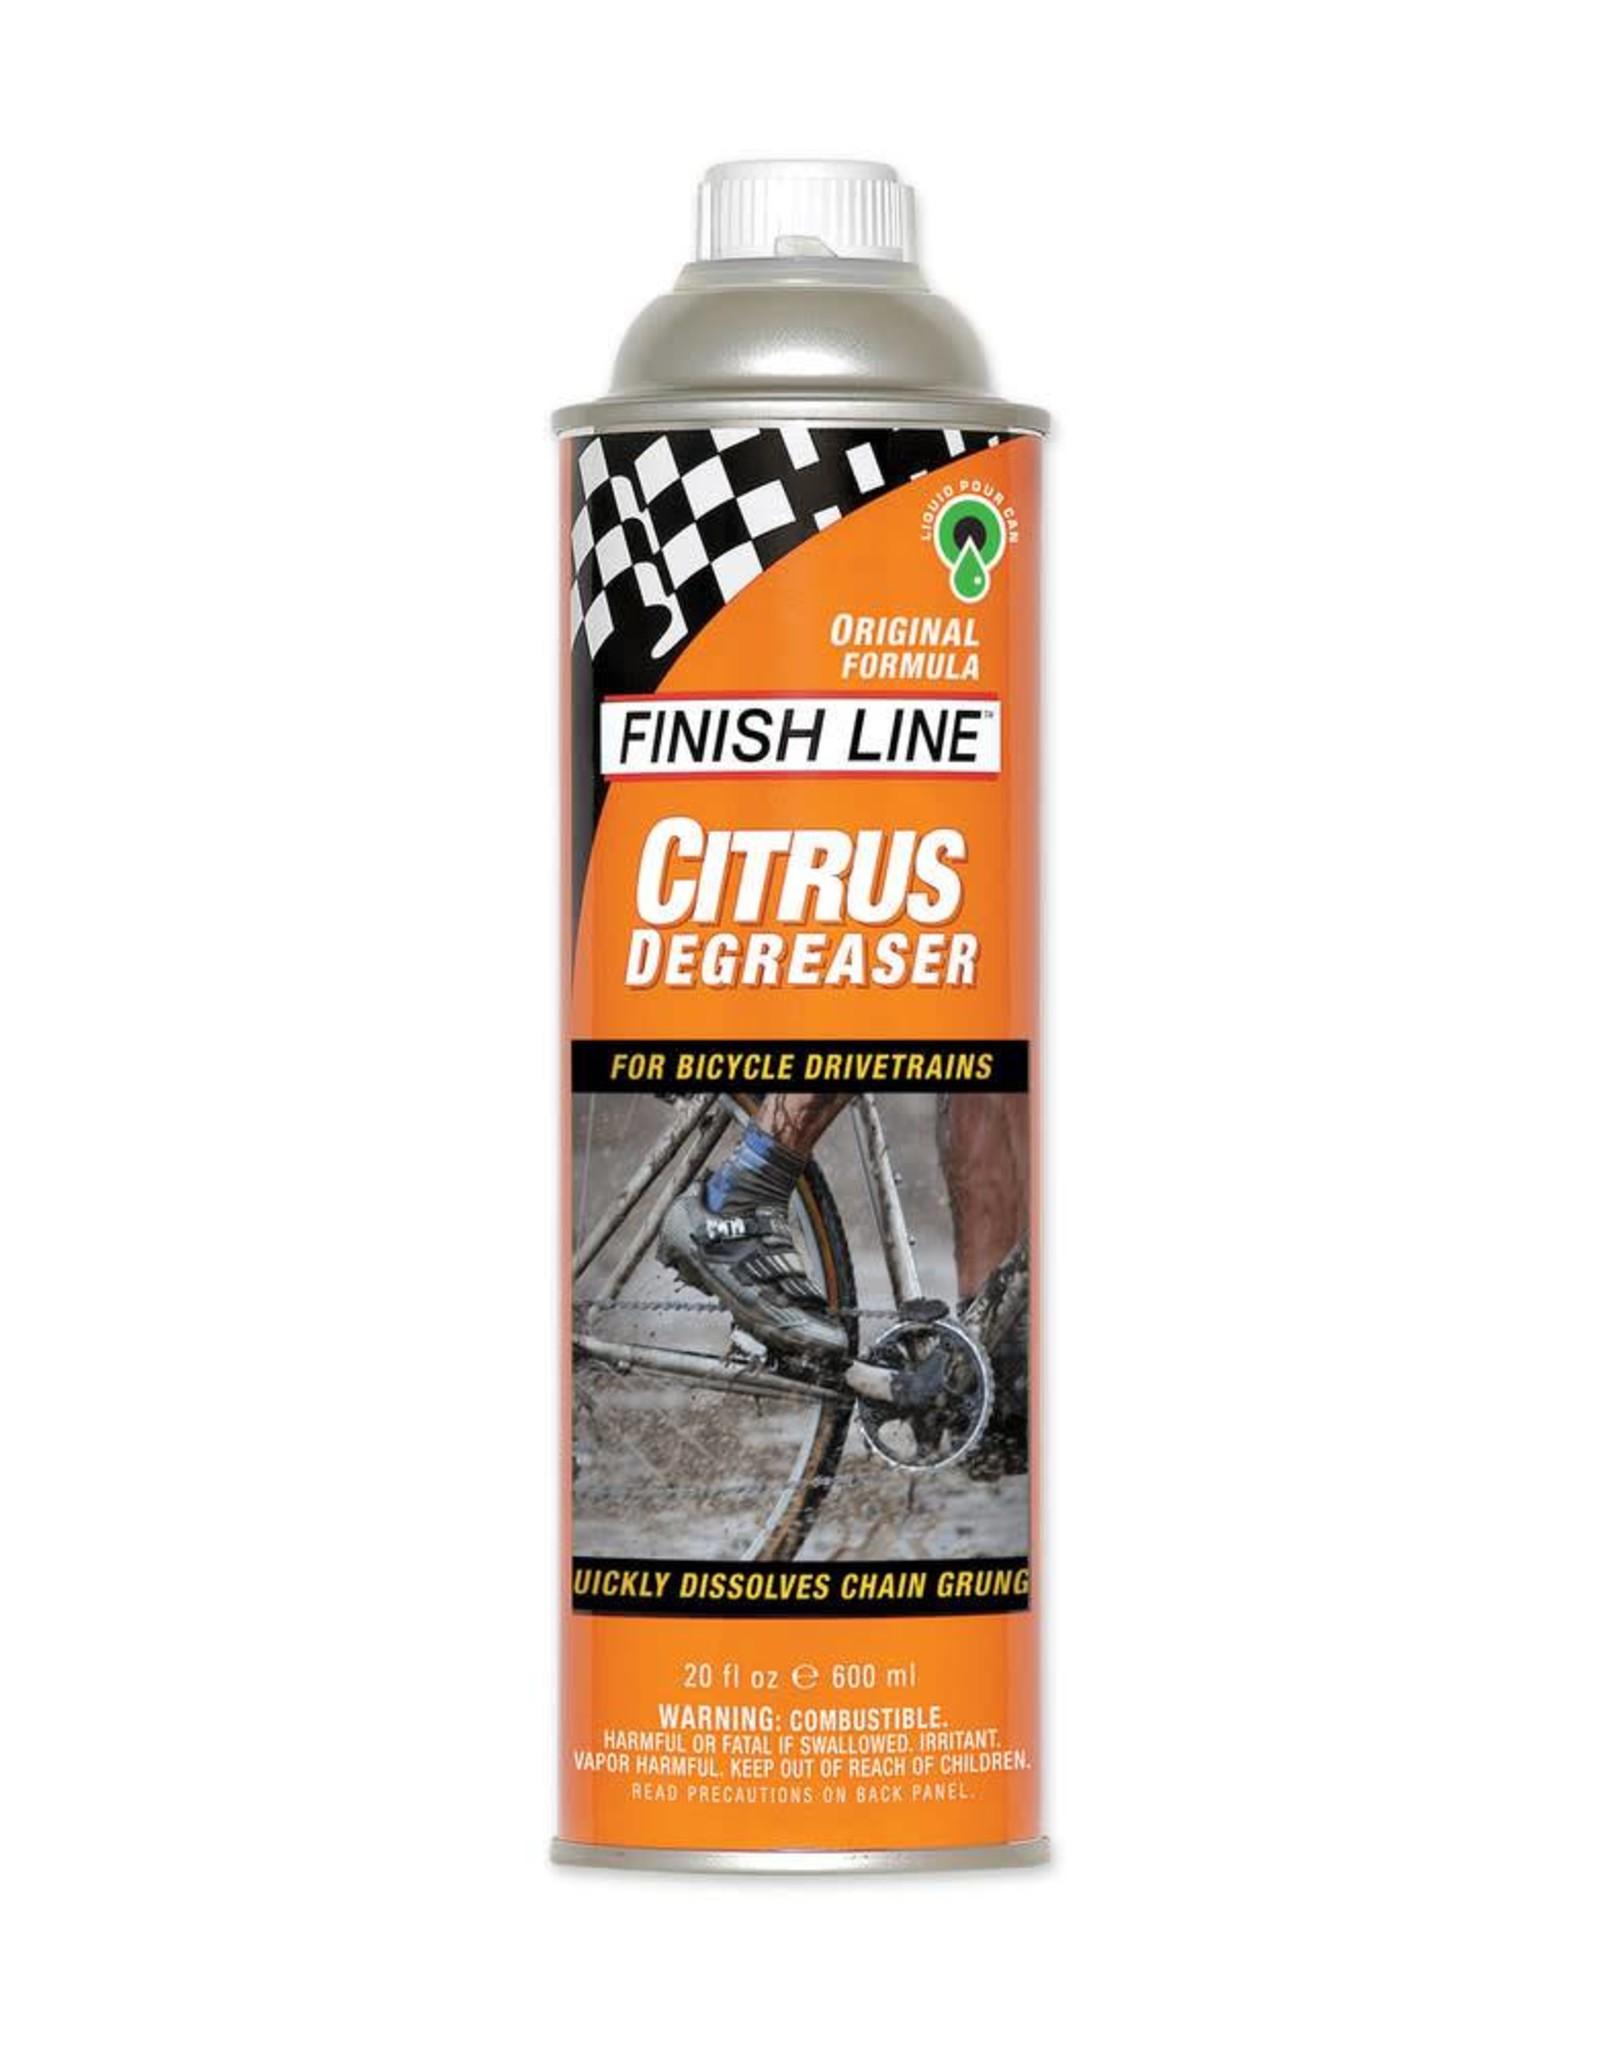 FINISH LINE Finish Line Citrus Degreaser Can - 600ml - Single